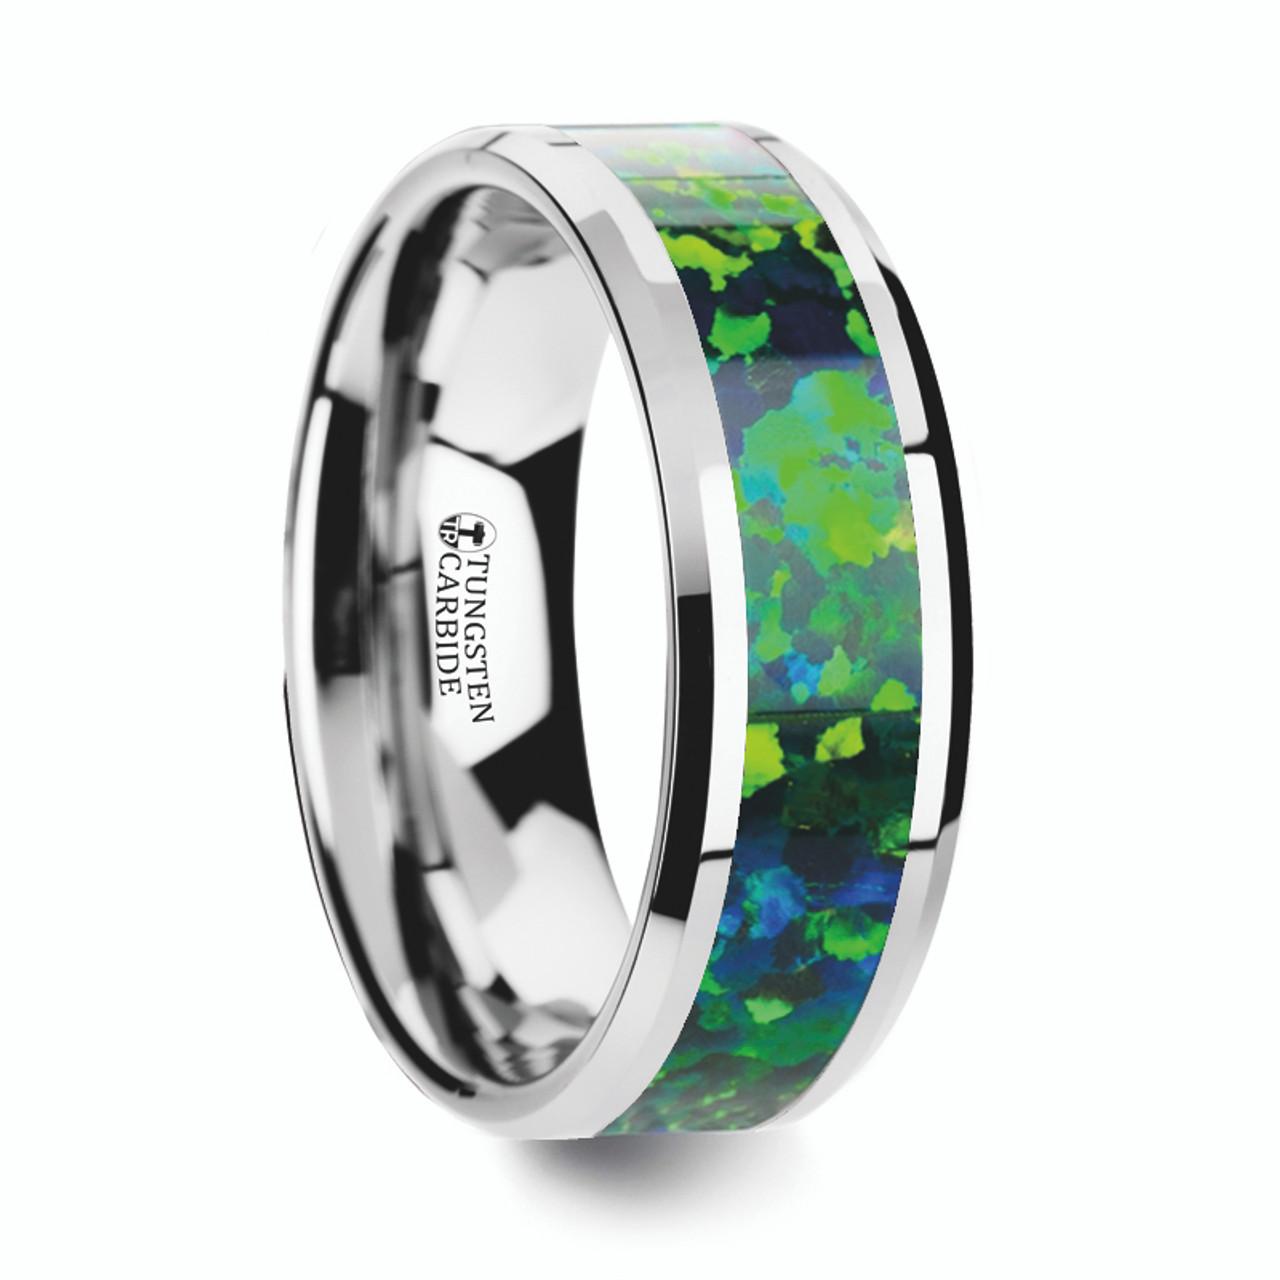 3a16a3839bedc Men's Photon Tungsten Wedding Band with Green/Blue Opal Inlay